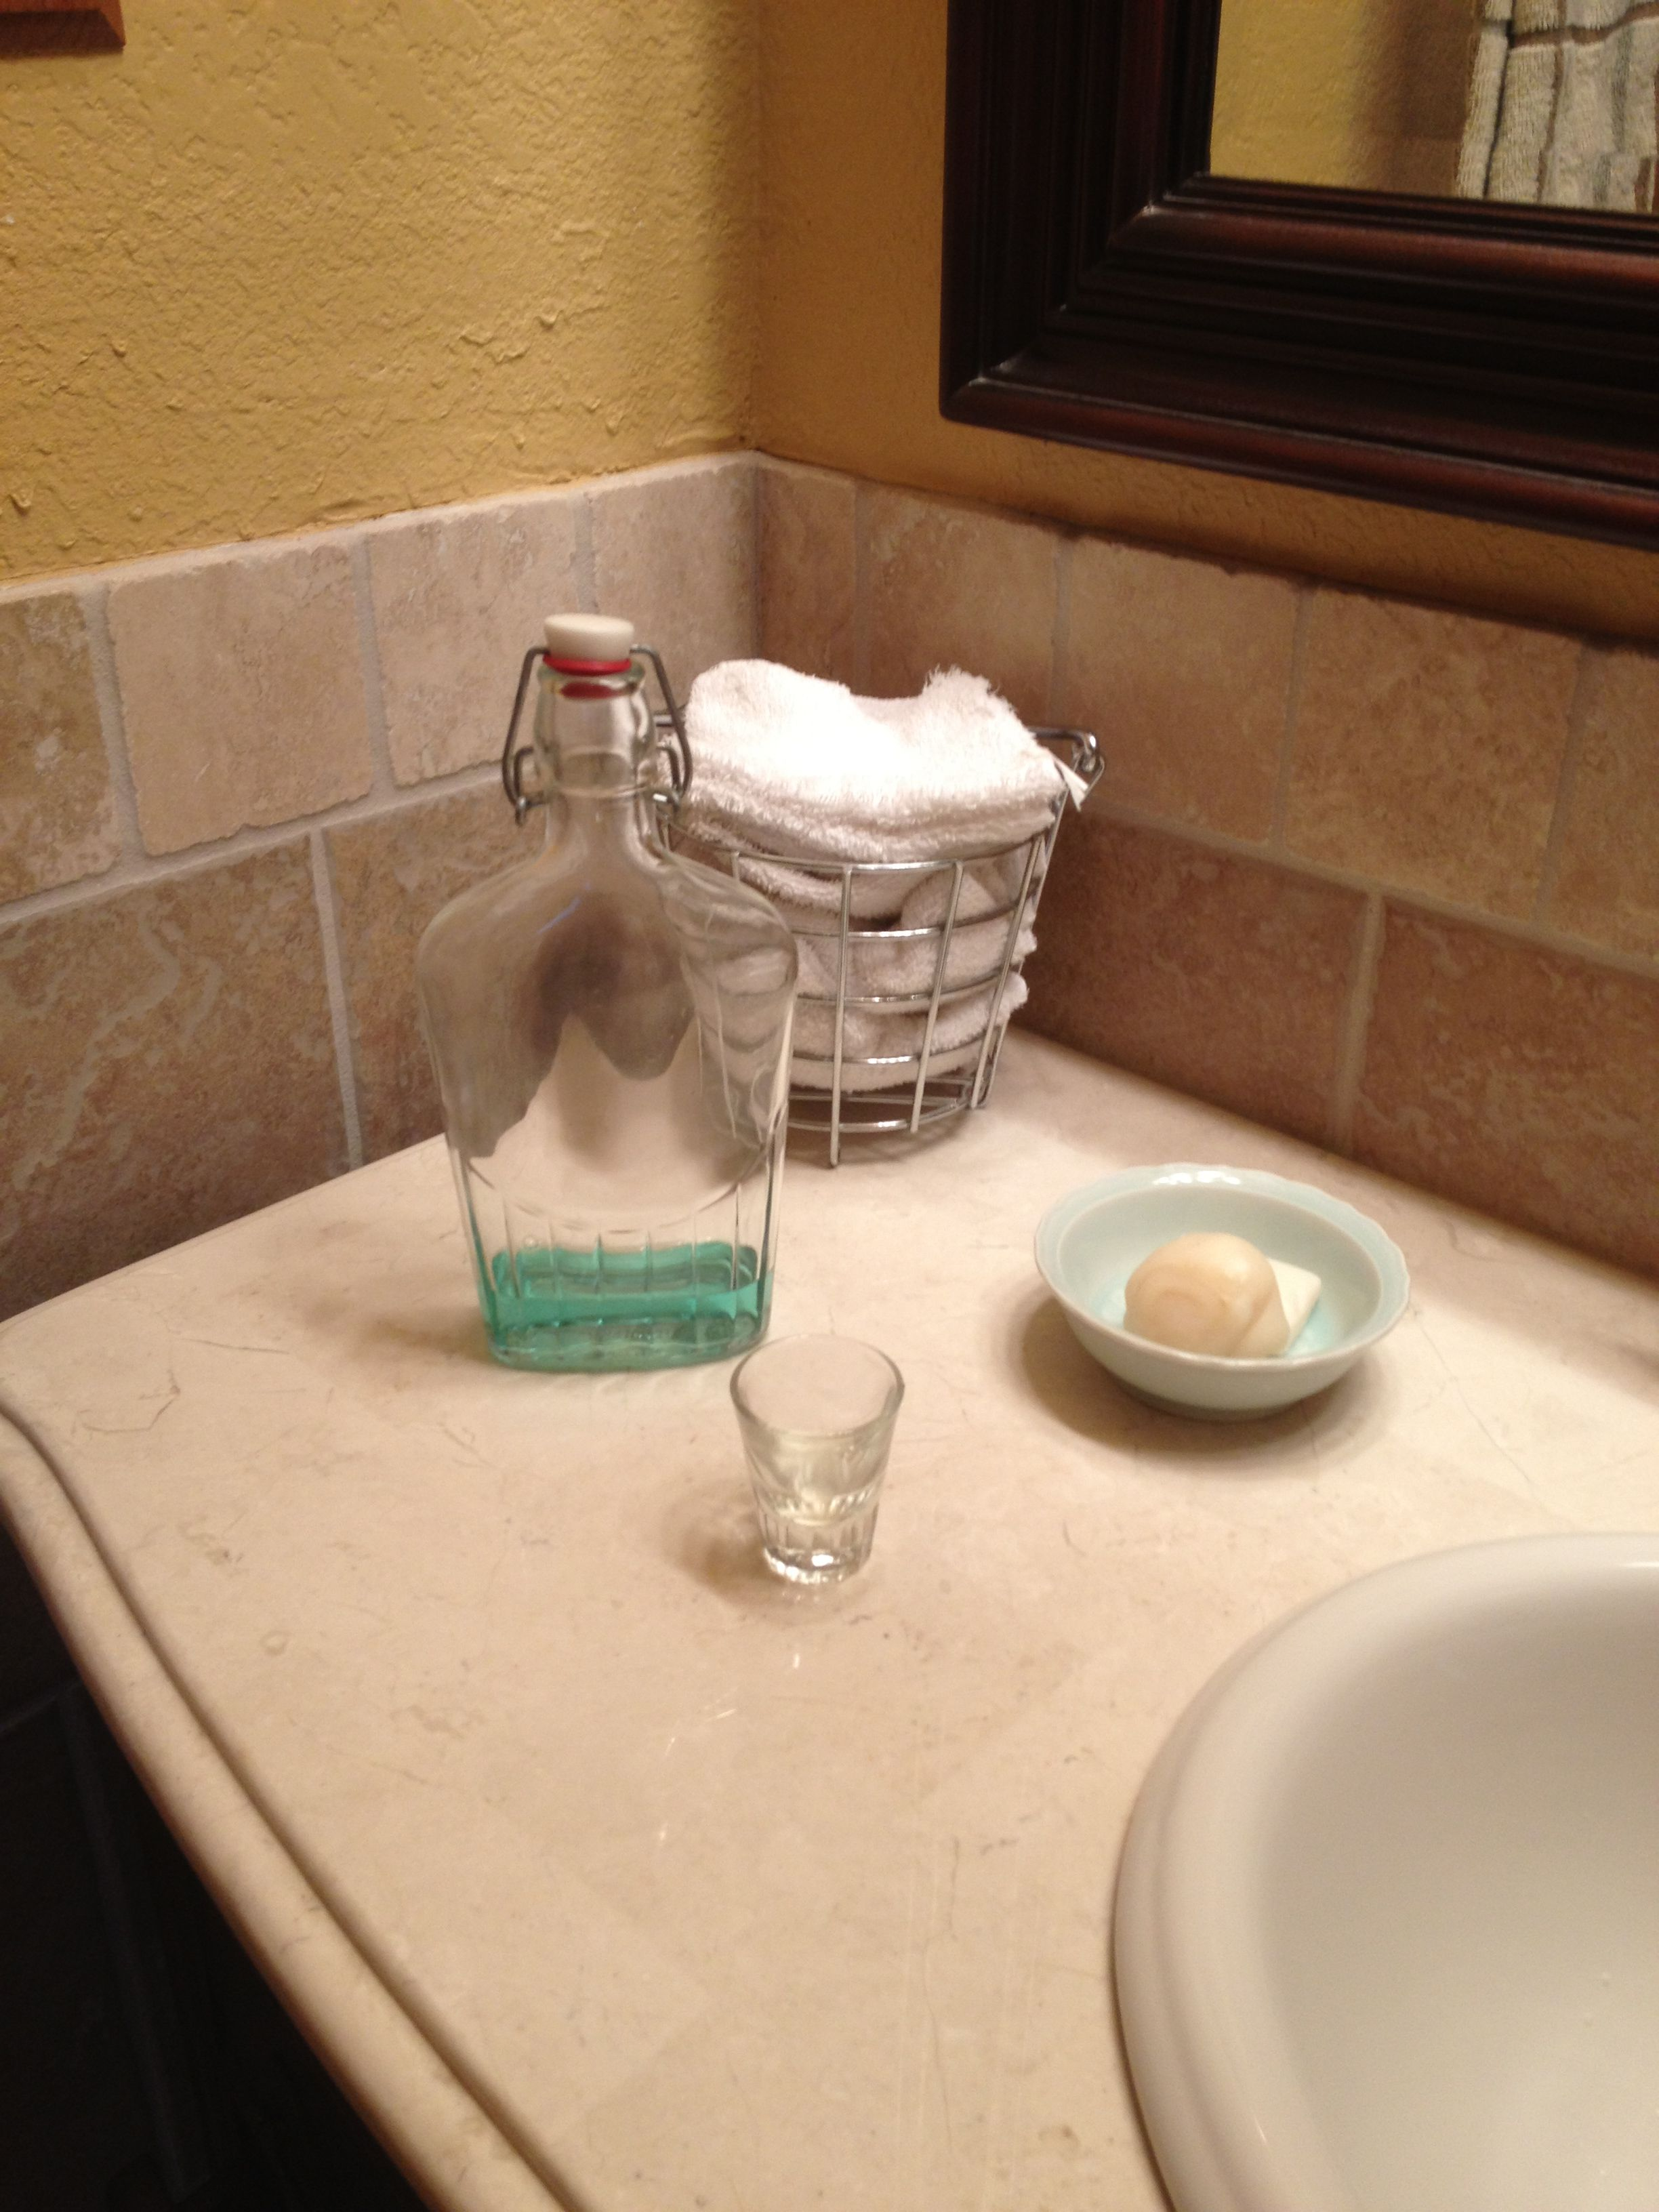 For The Bathroom Bottle For Mouthwash Shot Glass Instead Of